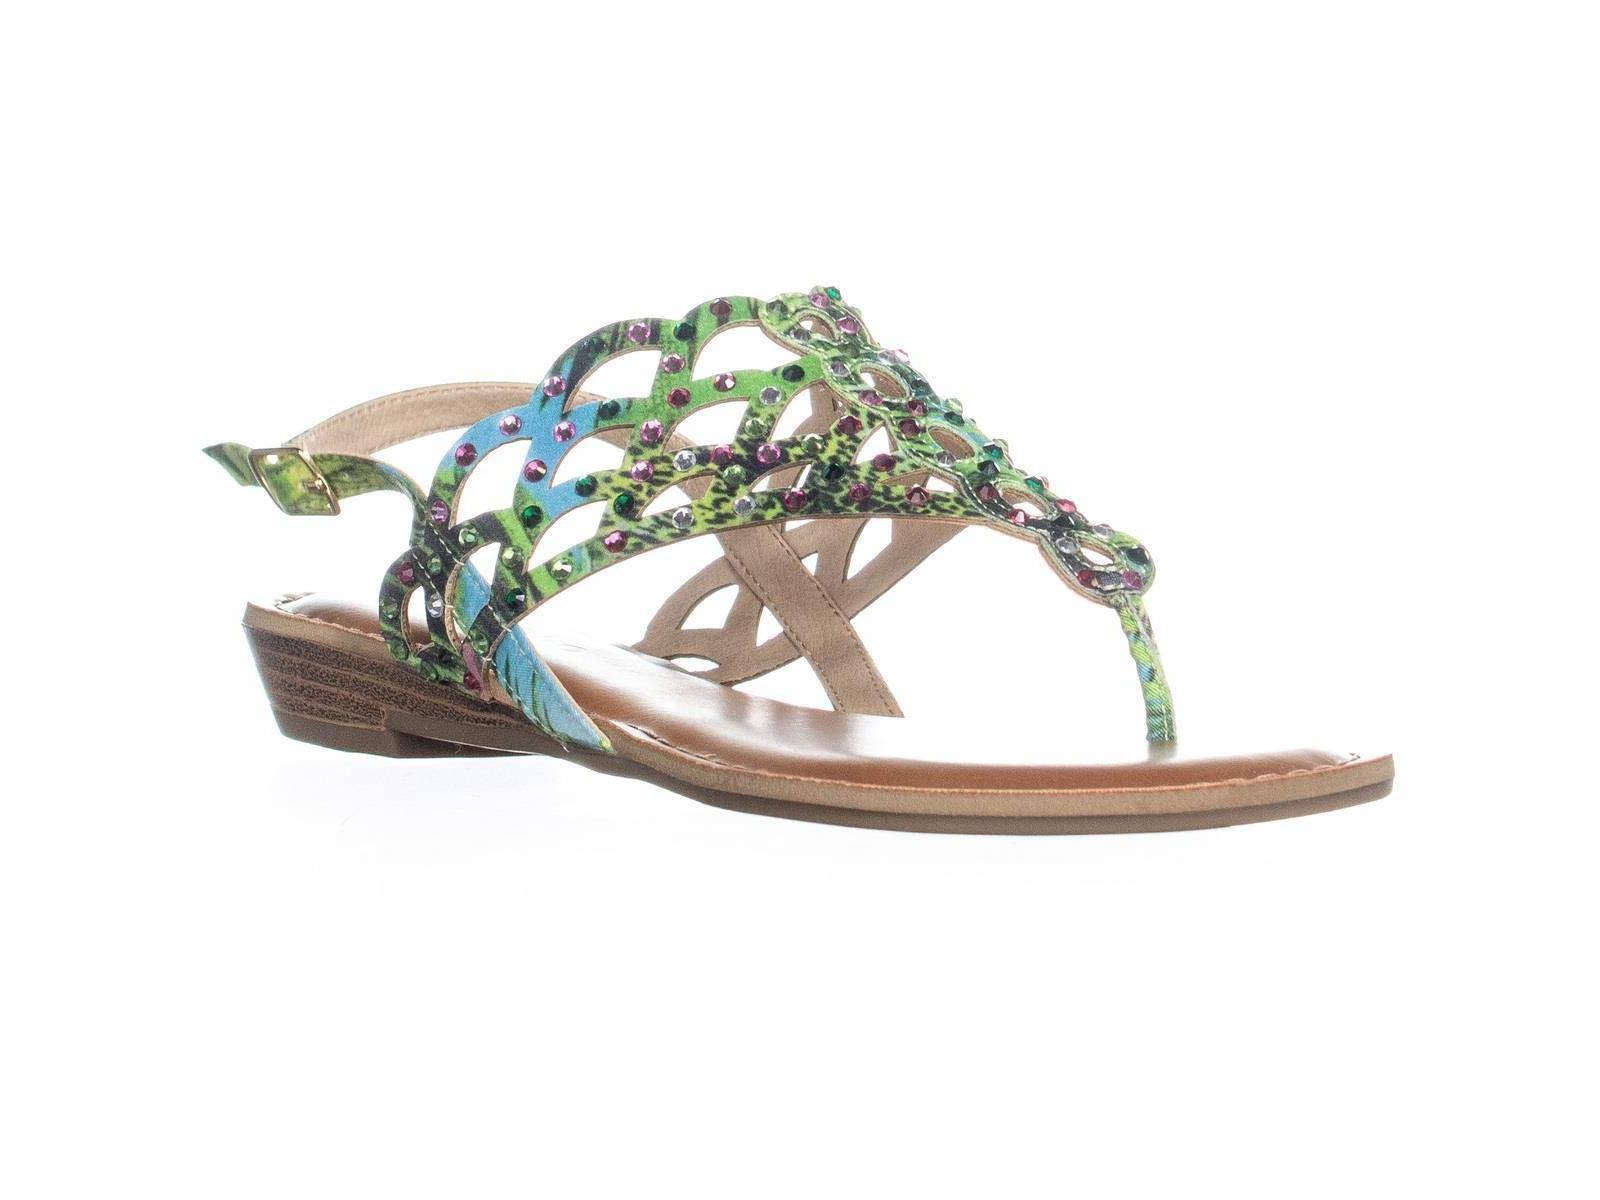 Size 8.5 Cinnamon Zigi Soho Womens Mariane Open Toe Casual Strappy Sandals